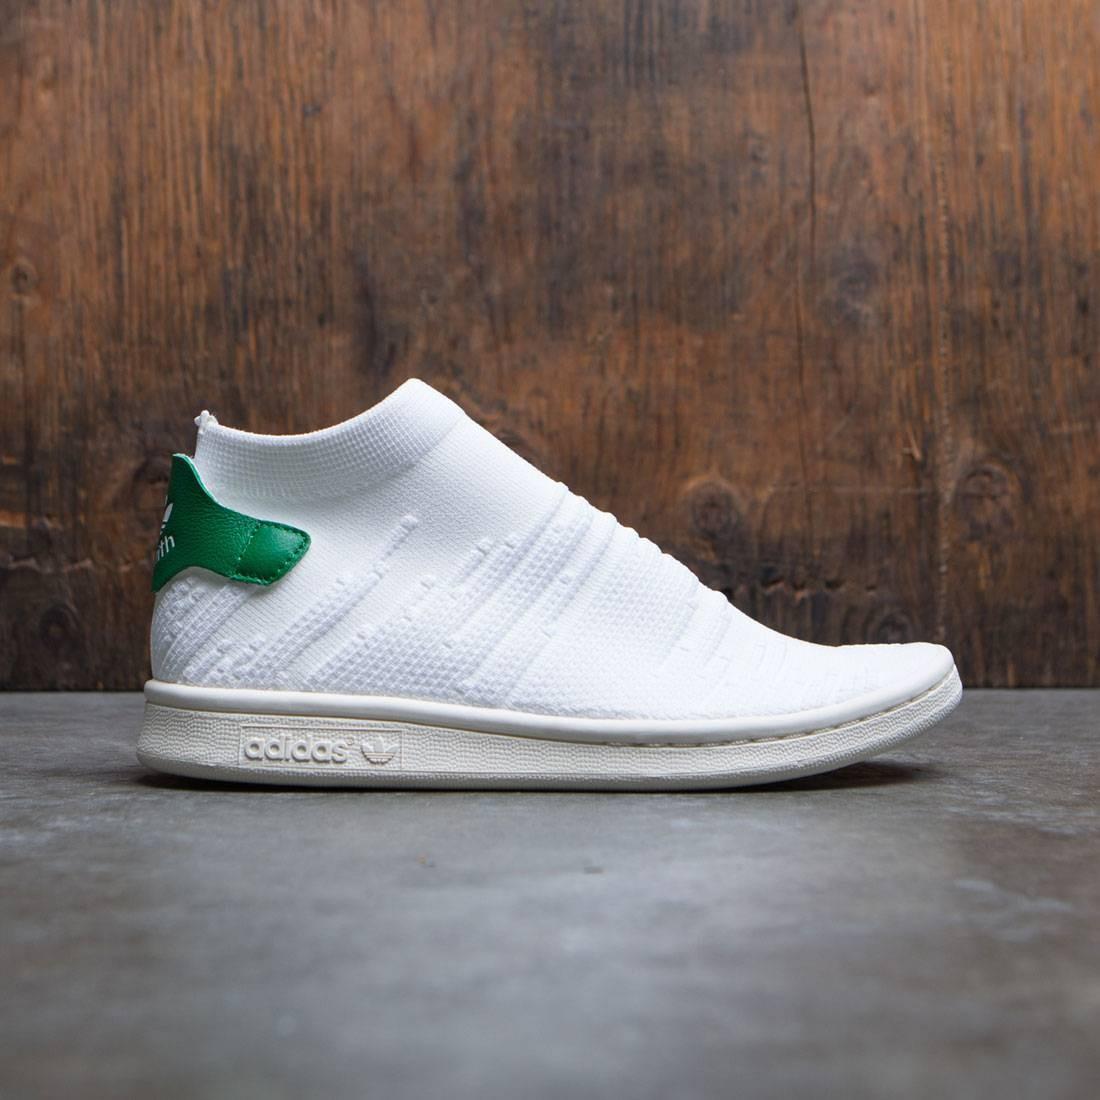 new styles 100% quality great fit Adidas Women Stan Smith Sock Primeknit W (white / footwear white / green)